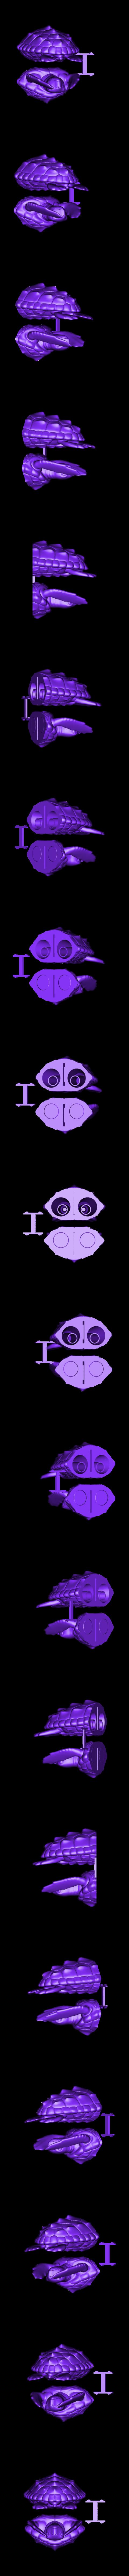 Loggerhead_plated.STL Download free STL file Loggerhead Sea Turtle (poseable) • 3D printer template, Ogubal3D